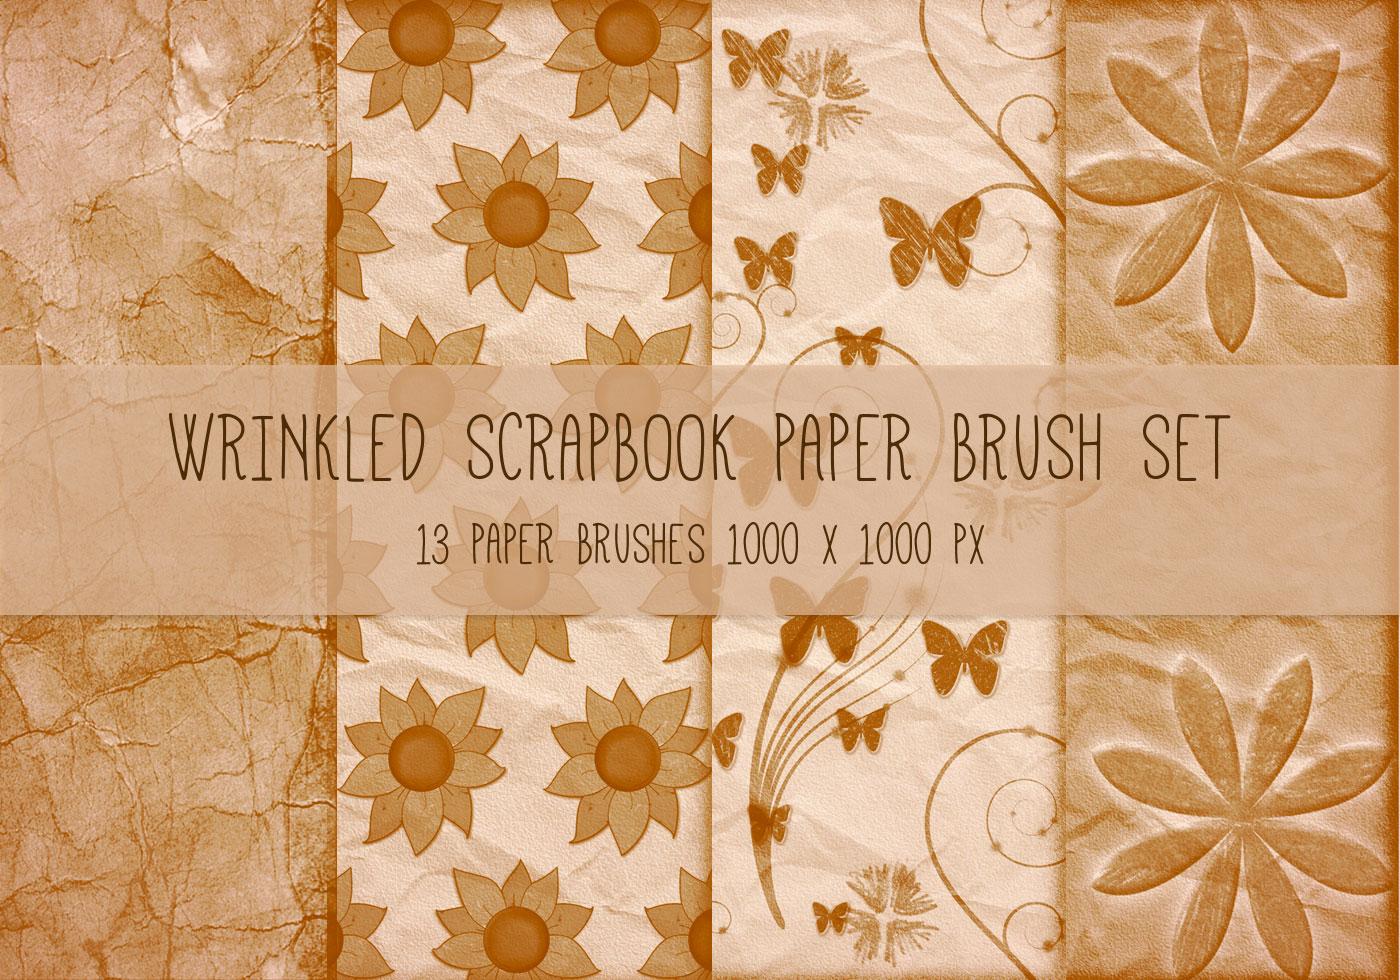 Scrapbook Papers Brushes Set 02 Free Photoshop Brushes